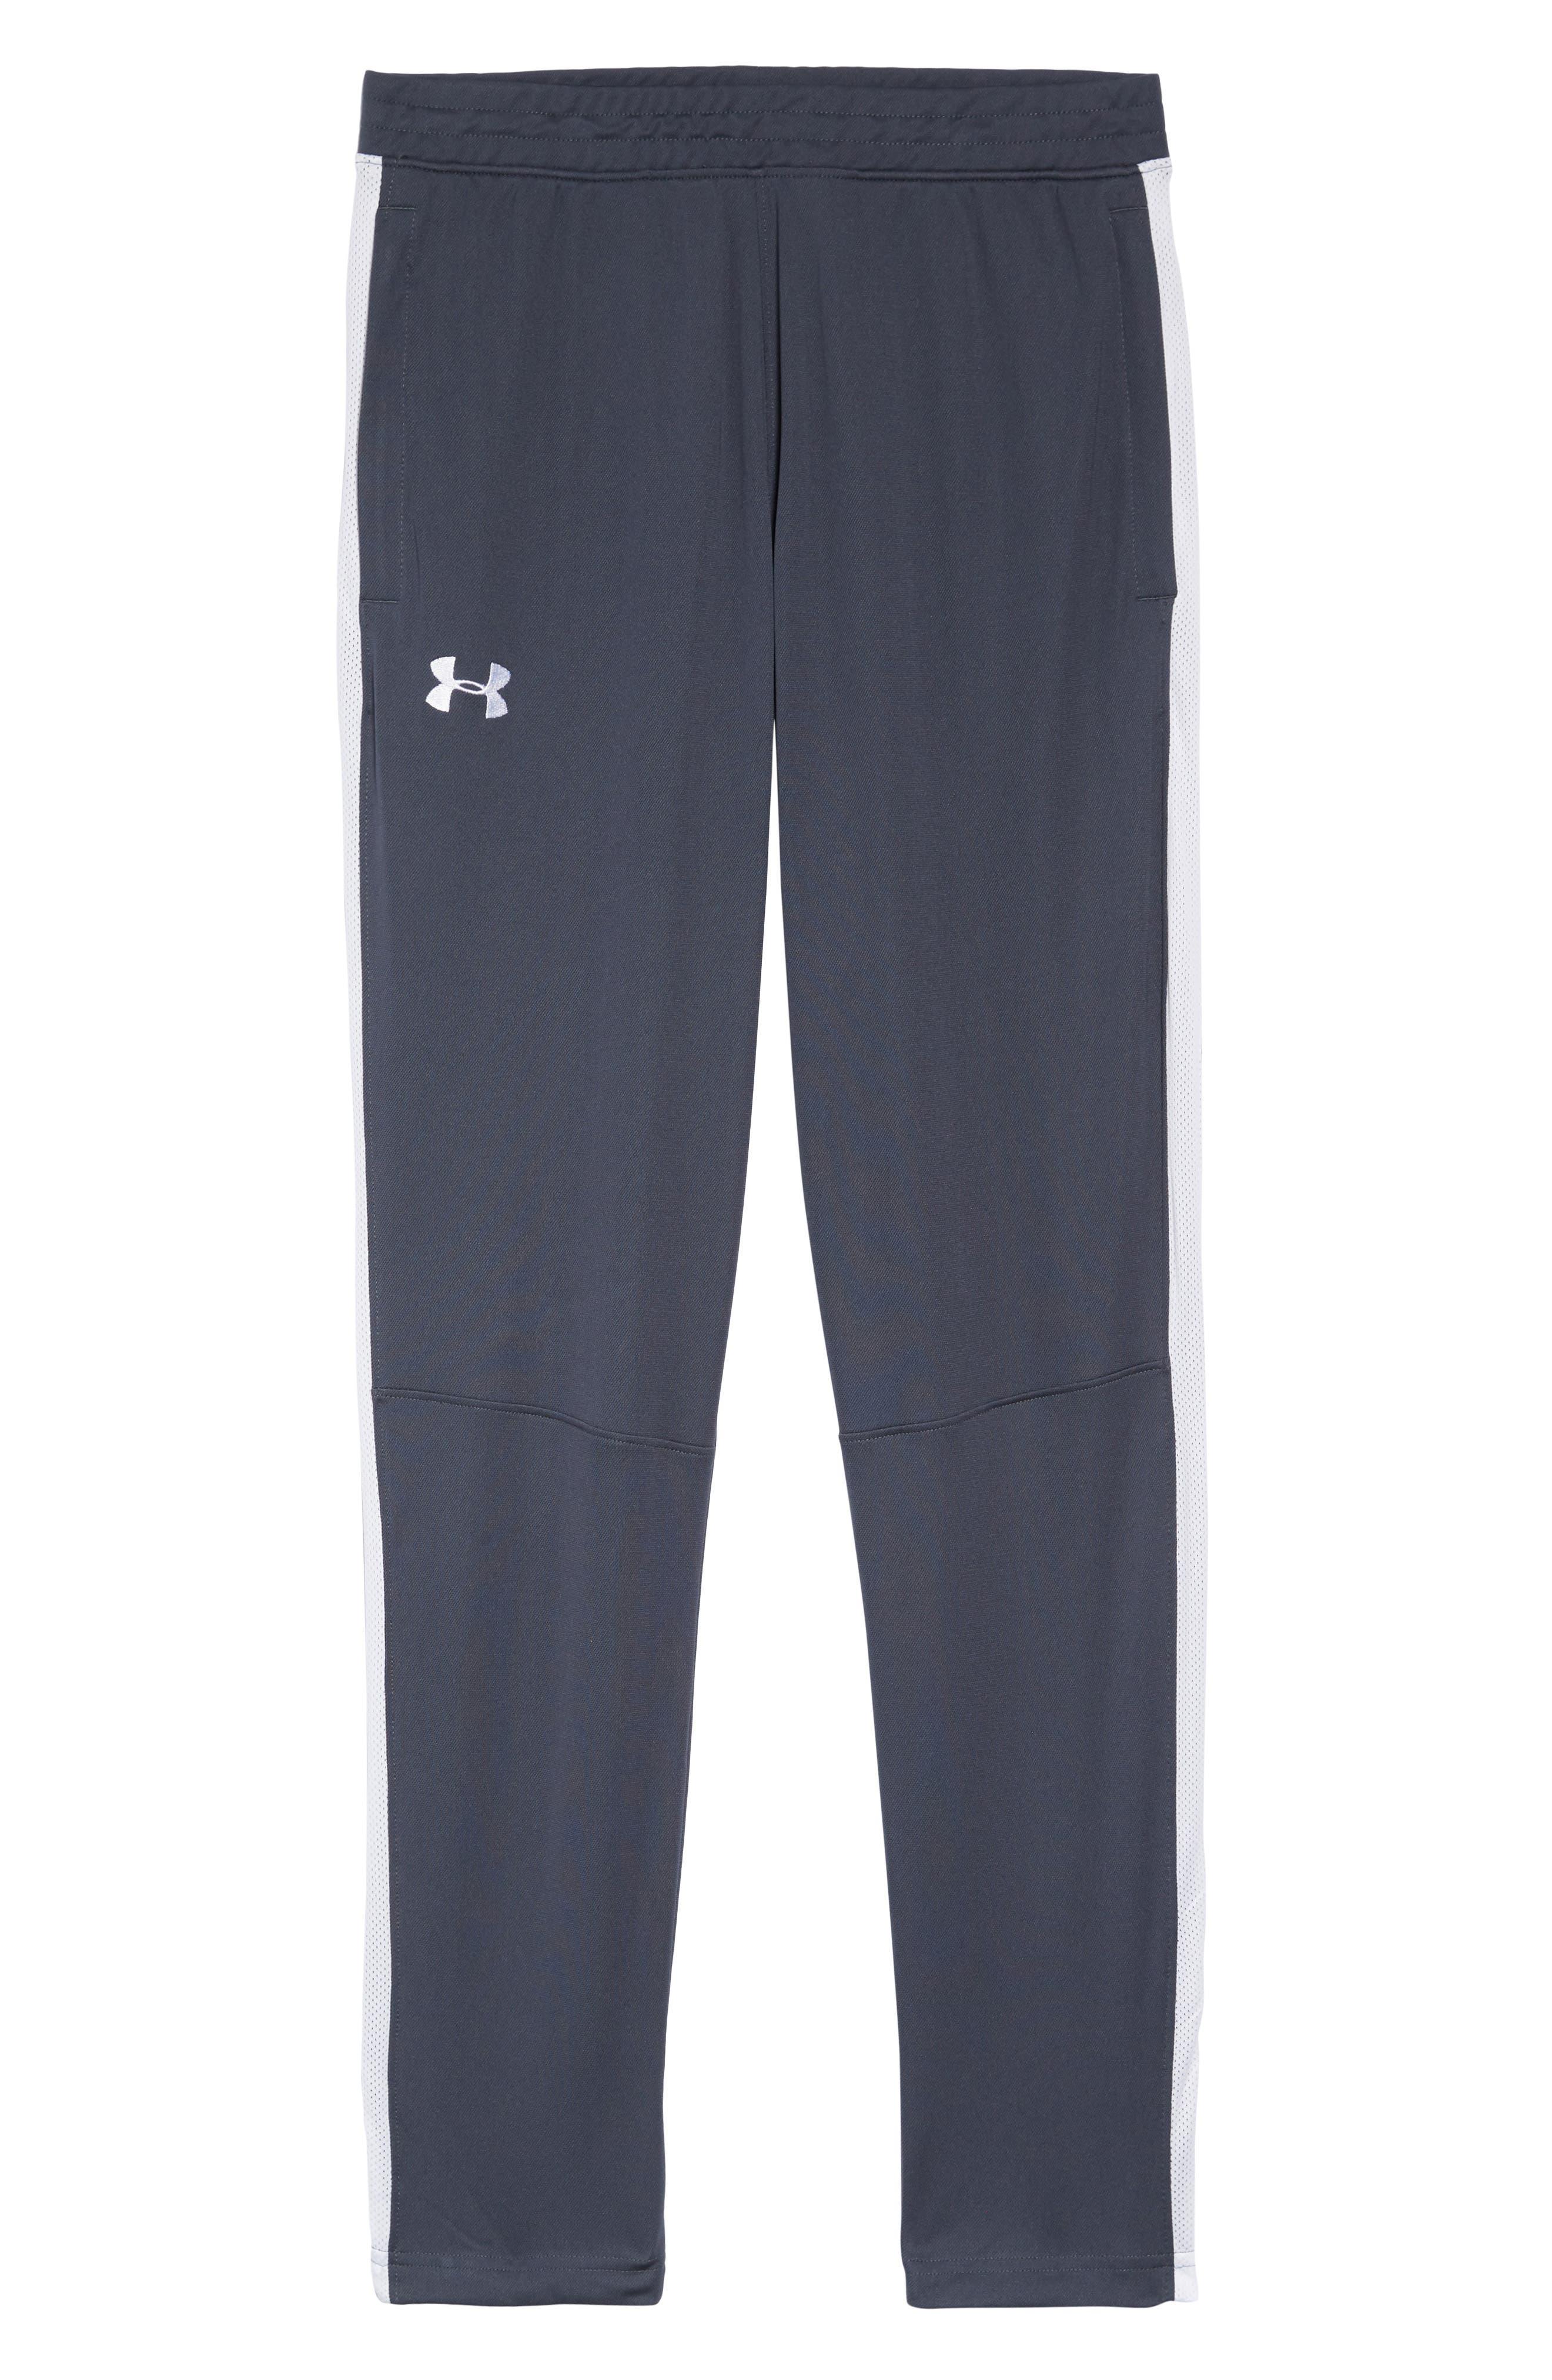 Sportstyle Slim Piqué Track Pants,                             Alternate thumbnail 6, color,                             STEALTH GRAY / / WHITE